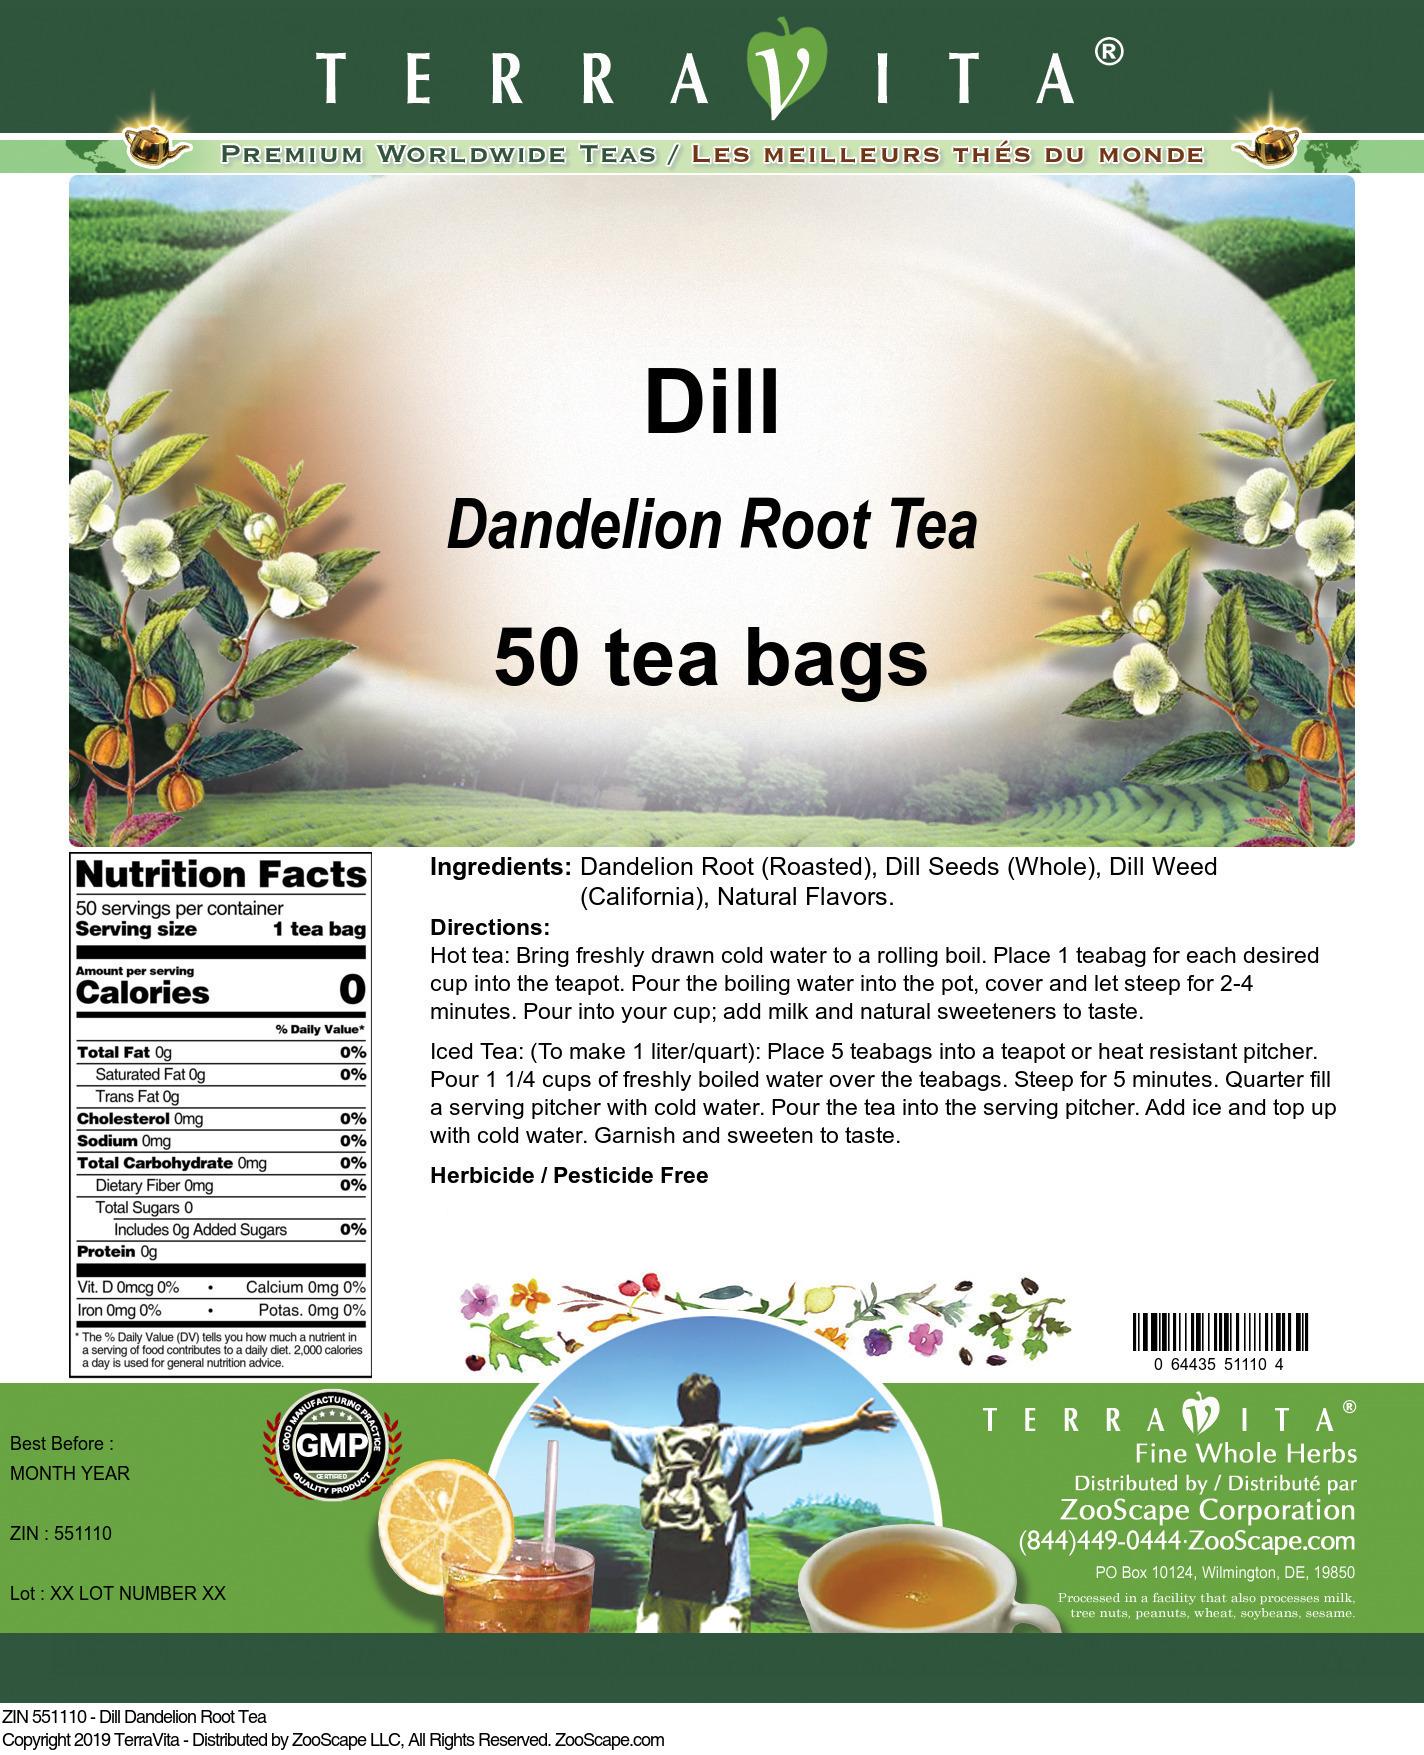 Dill Dandelion Root